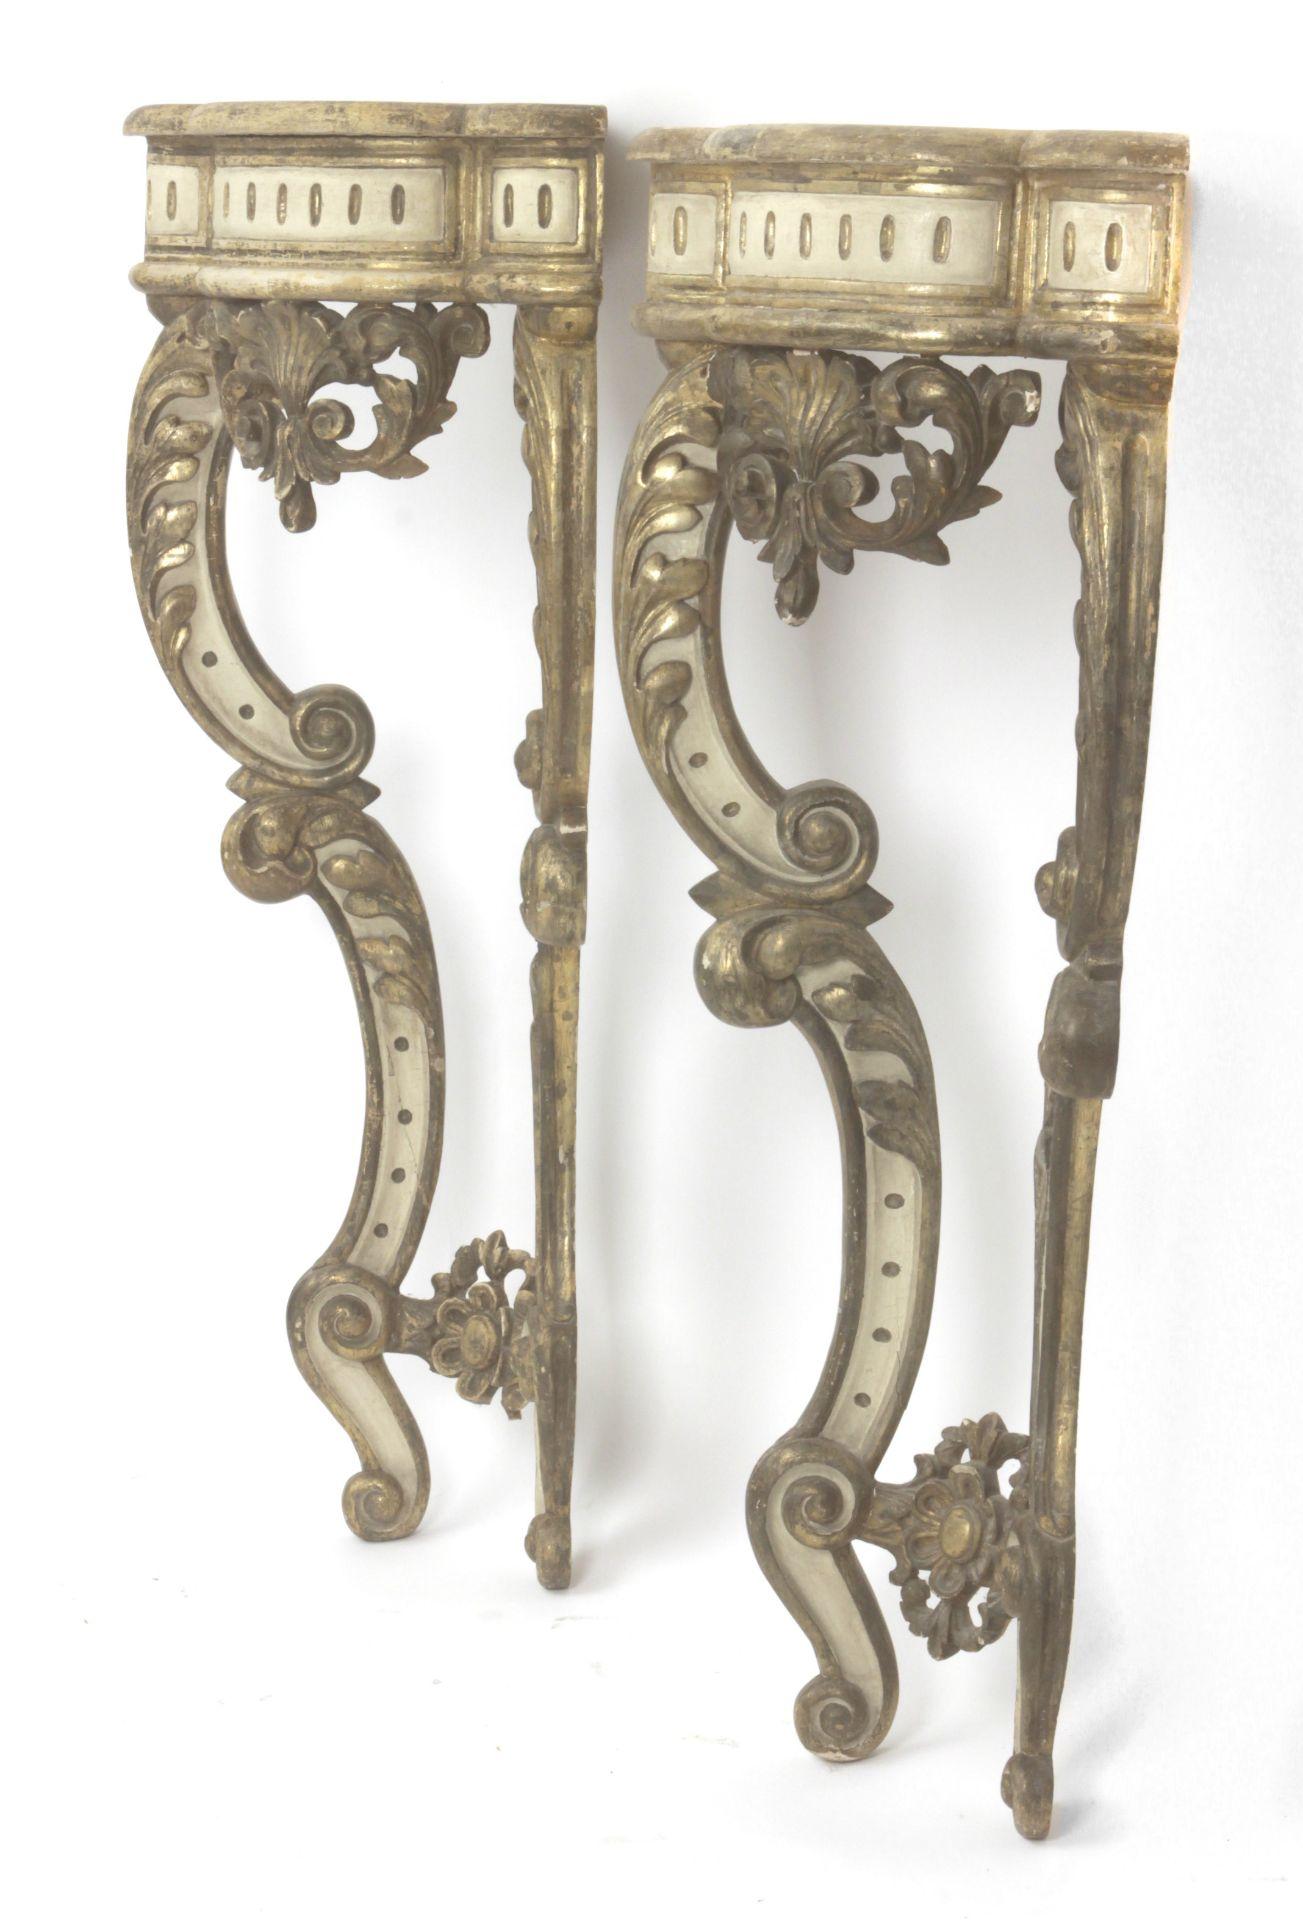 A pair of 20th century Louis XV style corbels - Bild 2 aus 4